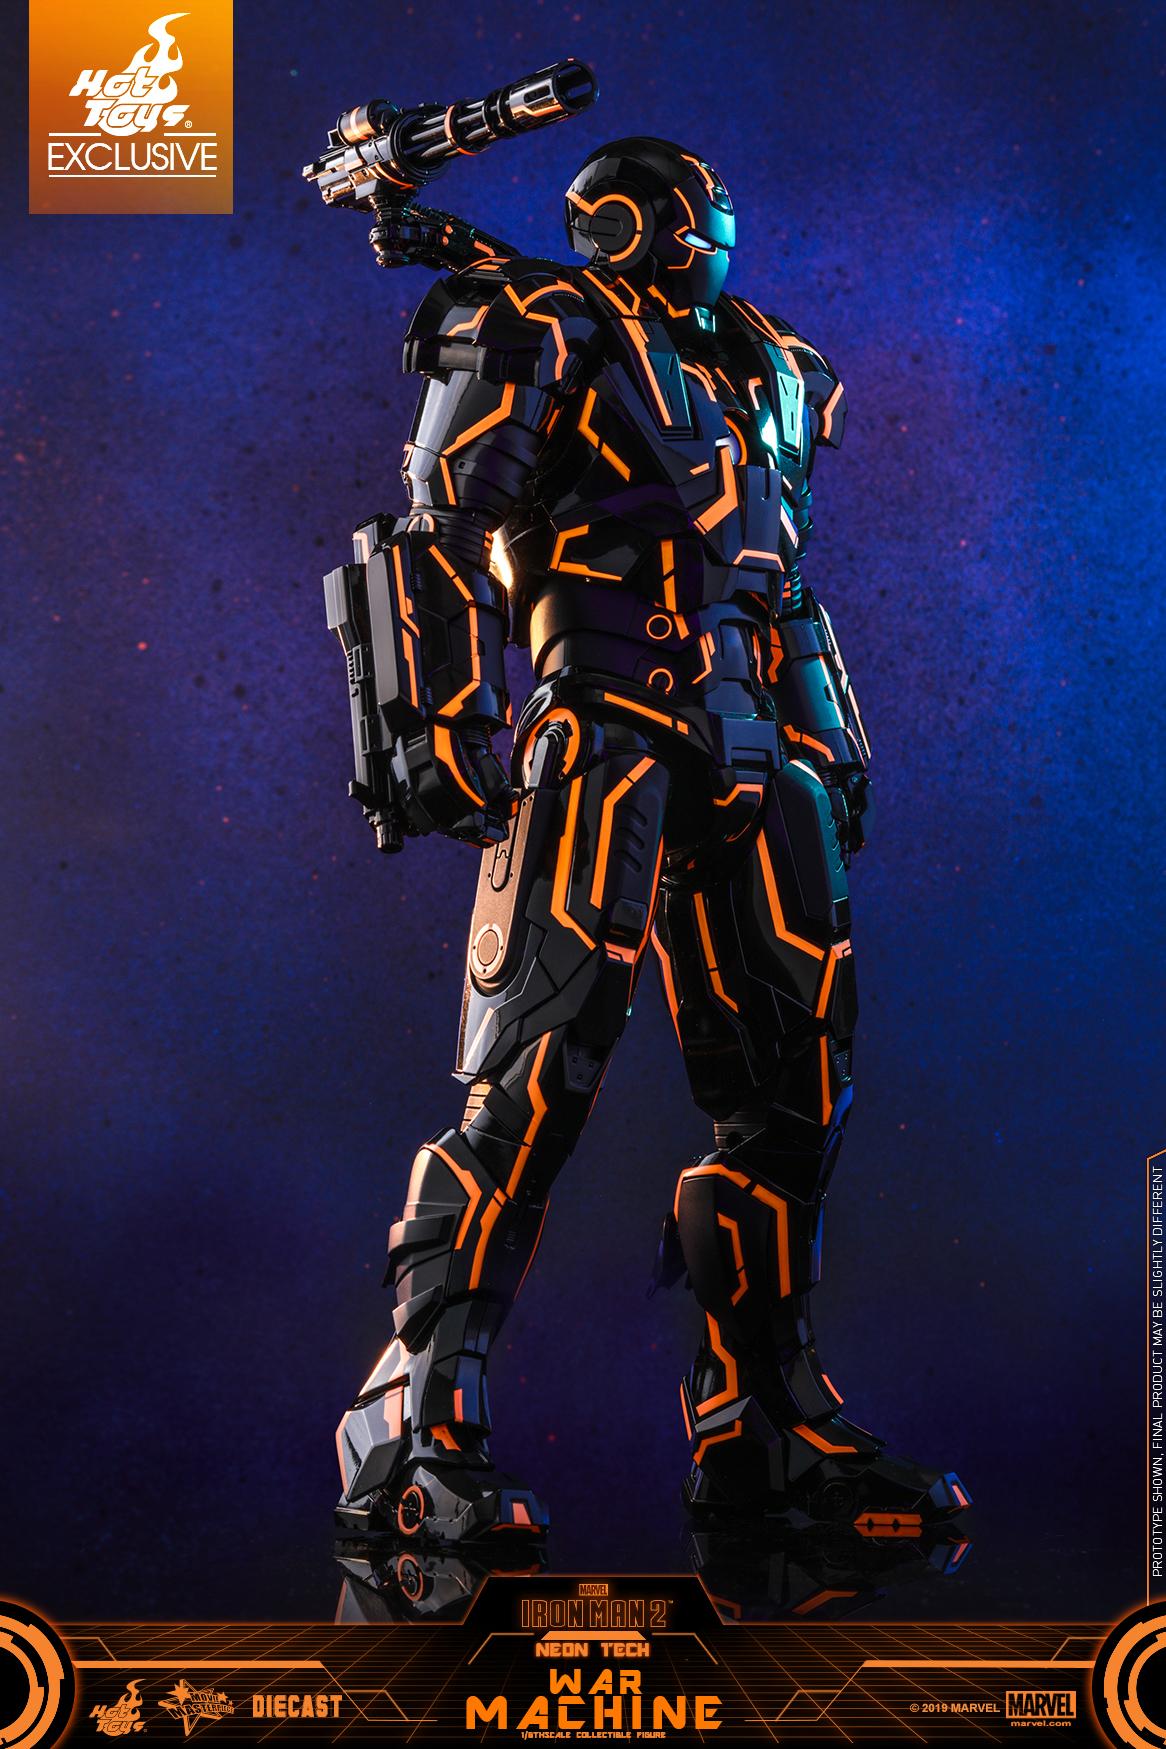 Hot Toys - Iron Man 2 - Neon Tech War Machine _PR17